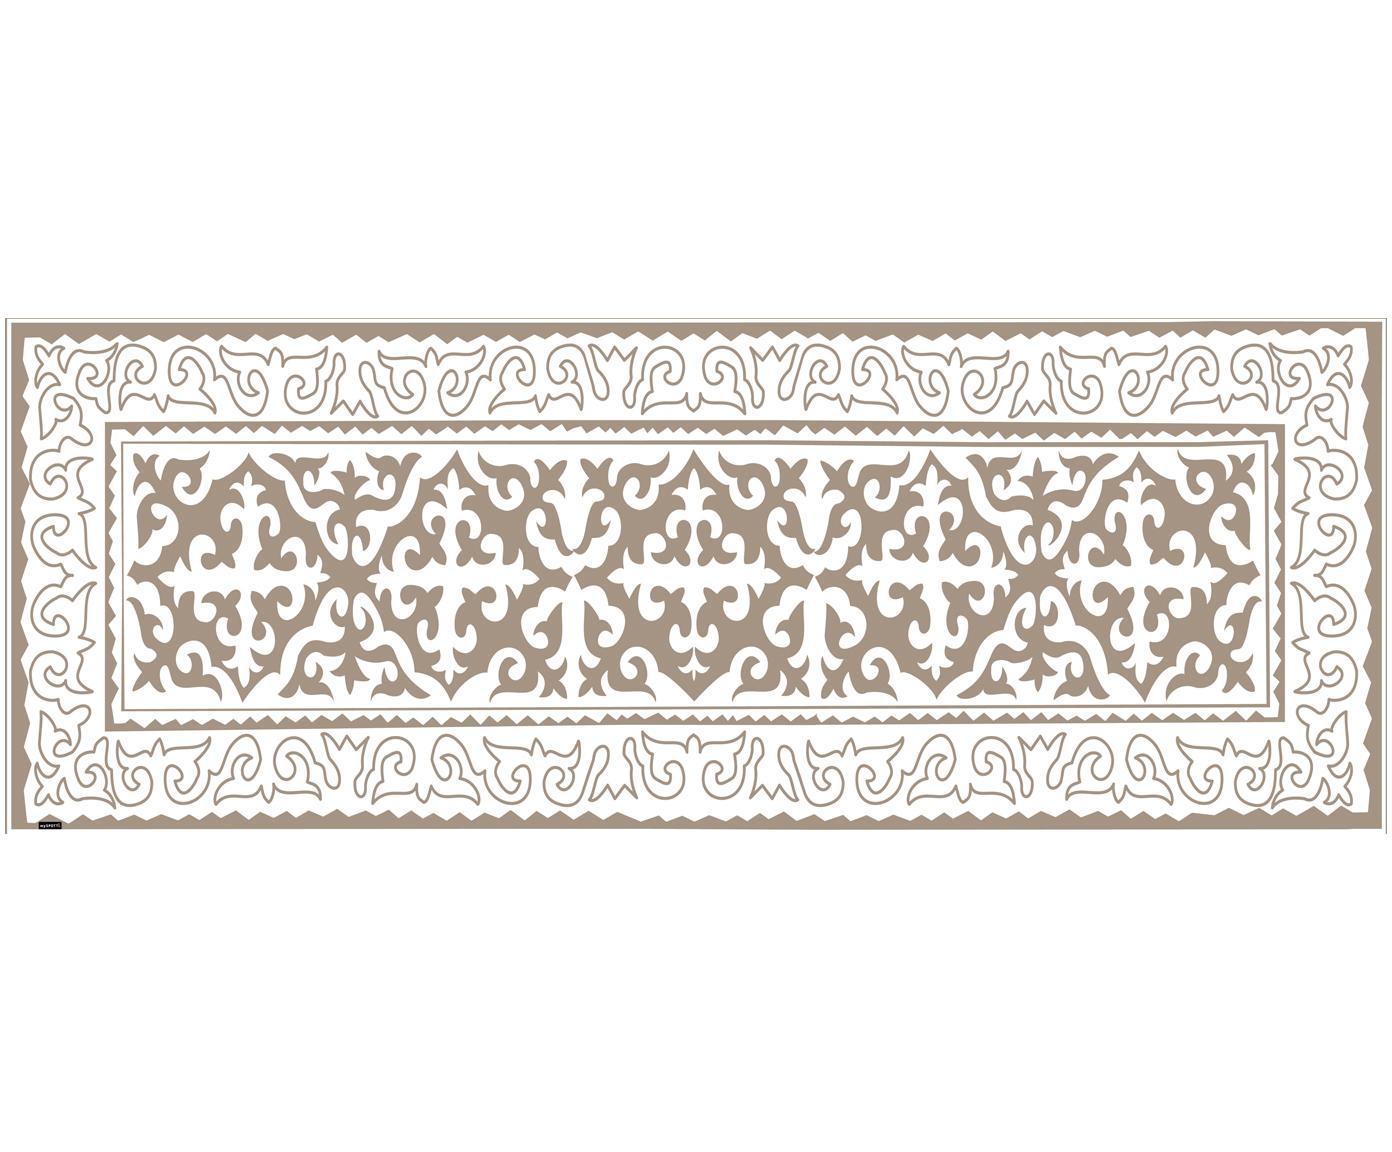 Vinyl-Bodenmatte Aksana, Vinyl, recycelbar, Taupe, Weiß, 70 x 180 cm